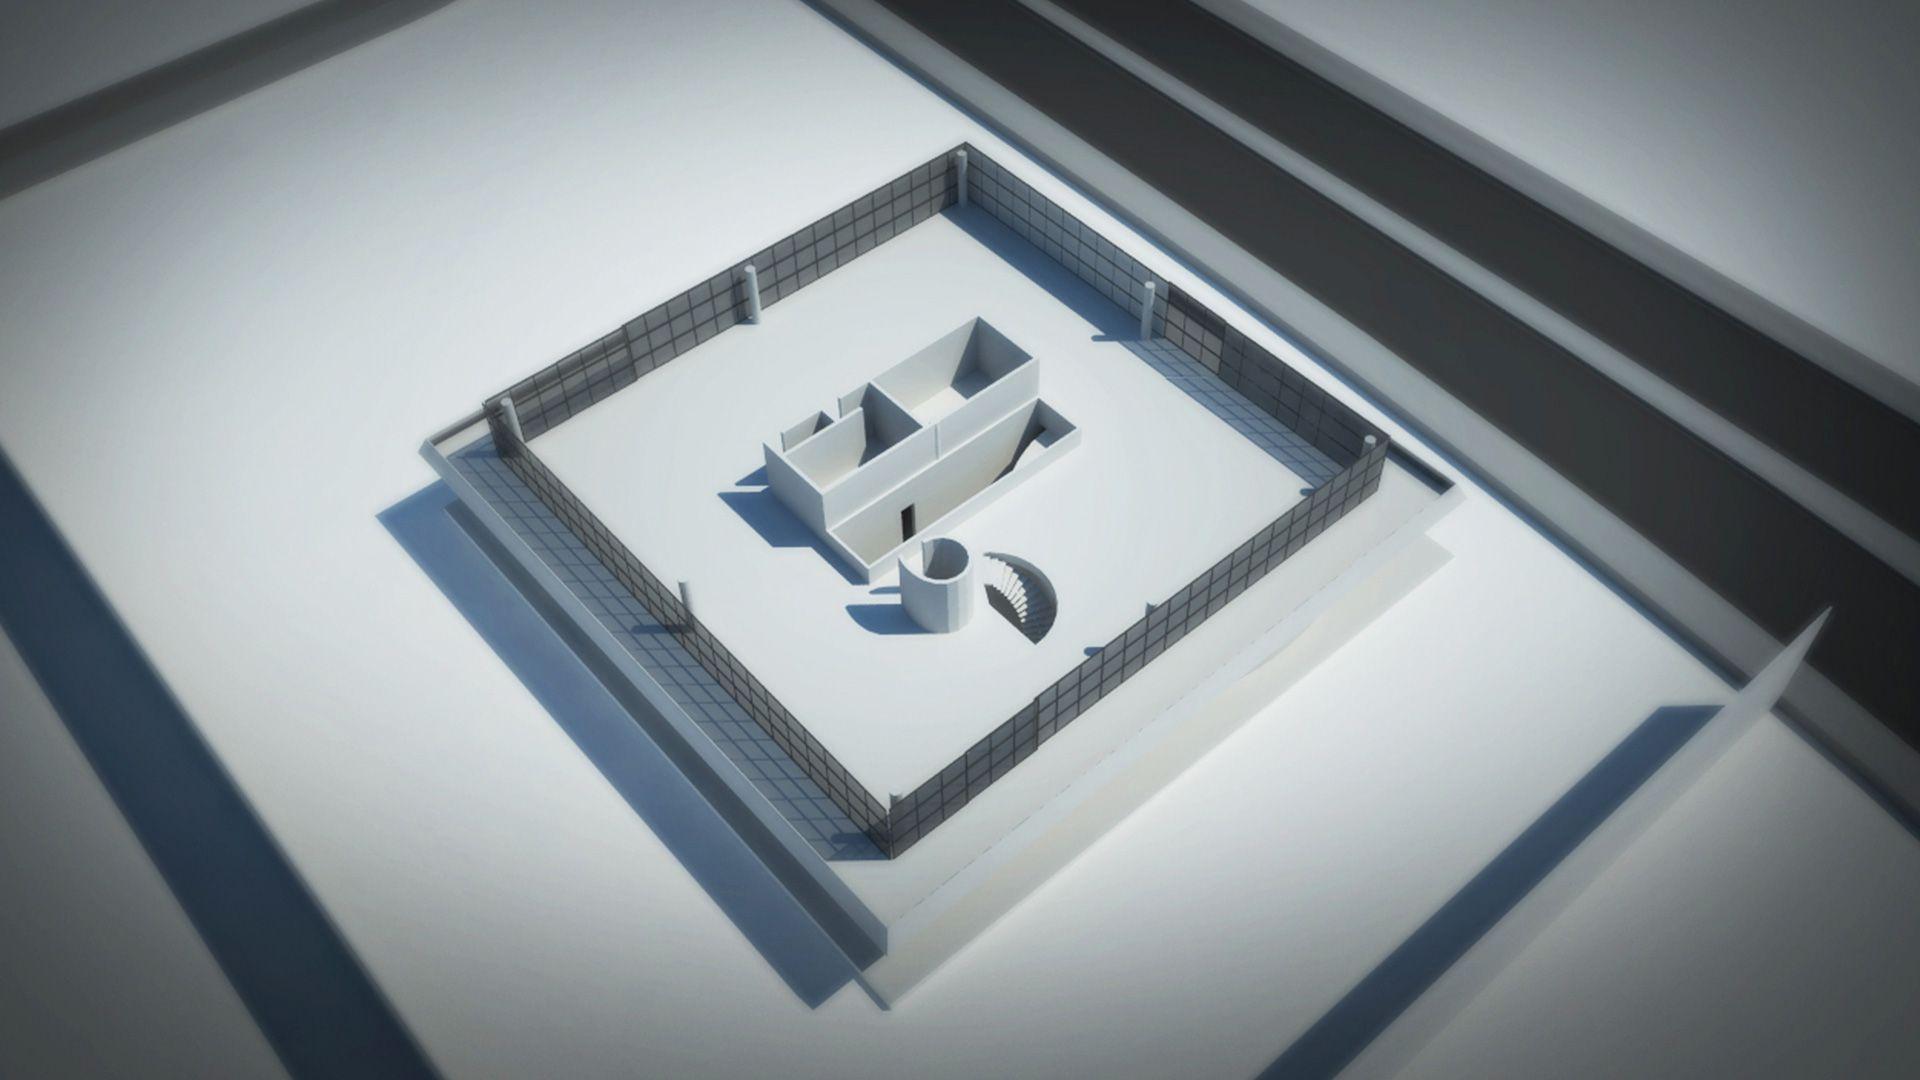 midiateca-santo-andre-render-layout-1-pavimento-existente